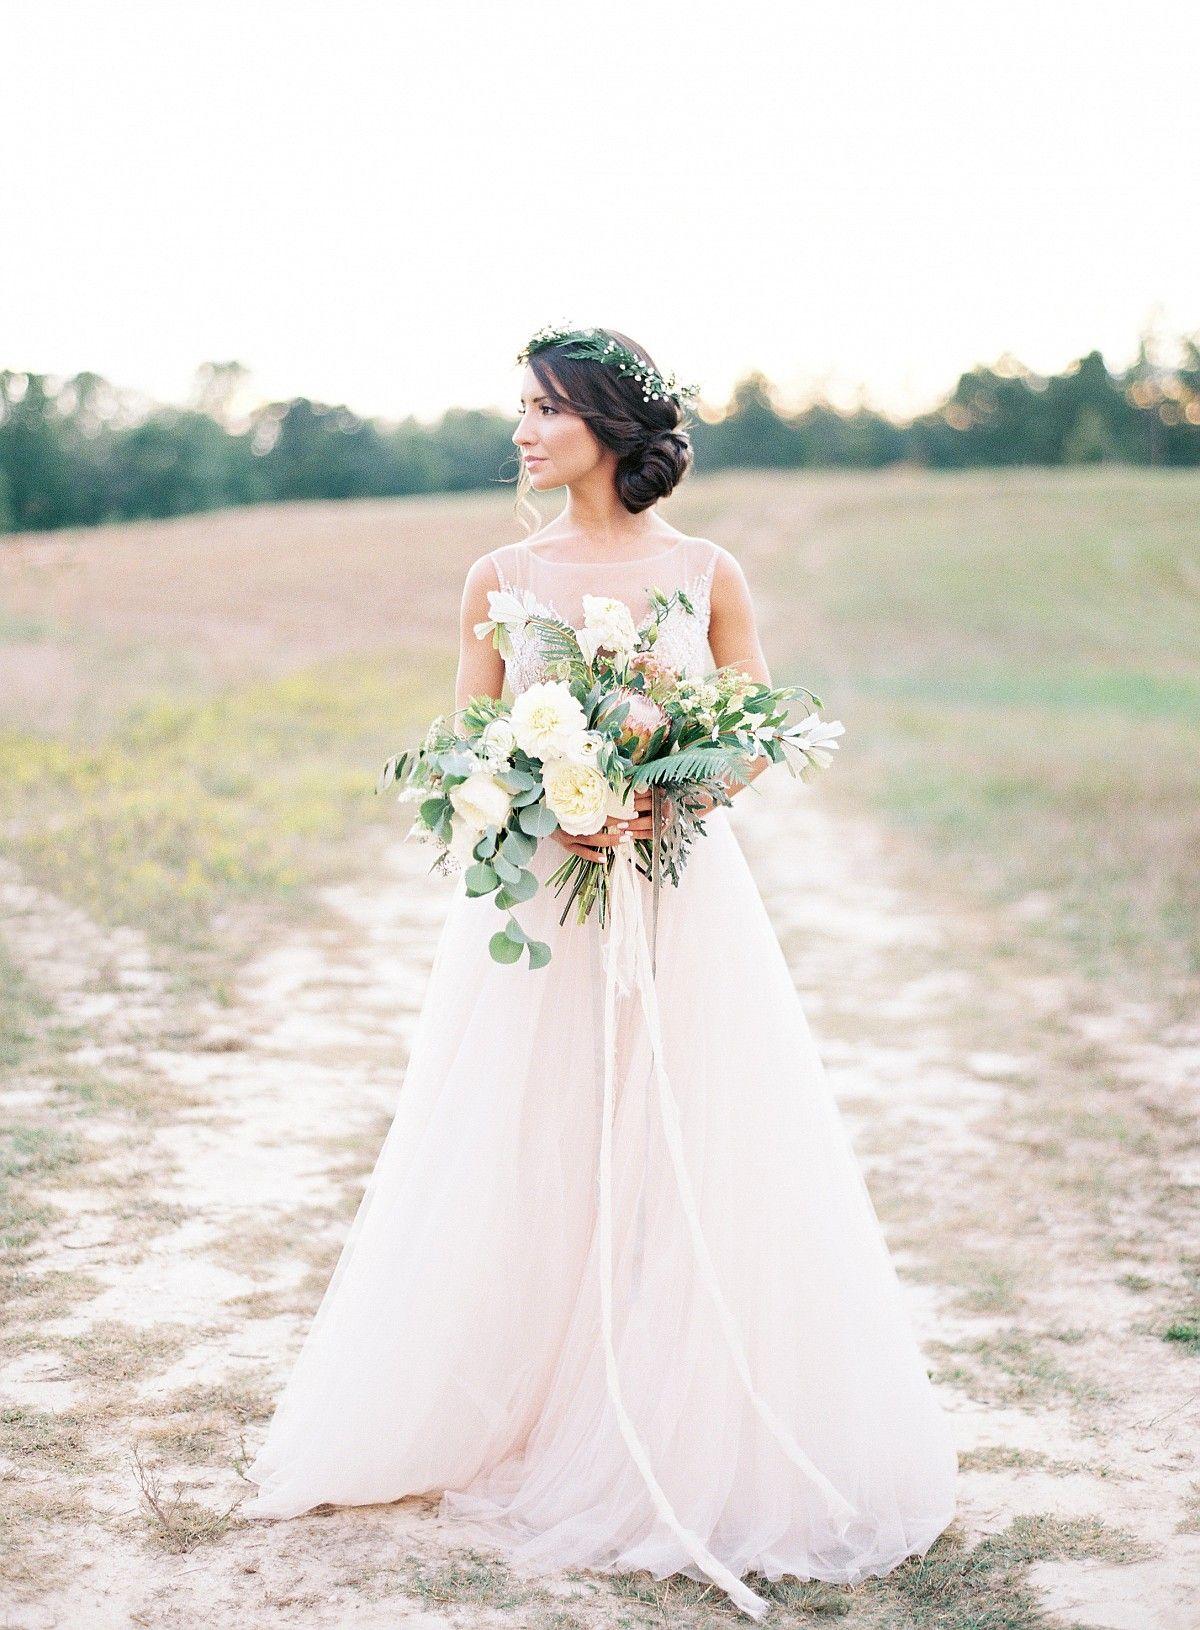 Light and Neutral Outdoor Wedding Ideas by Allison Kuhn | Wedding ...